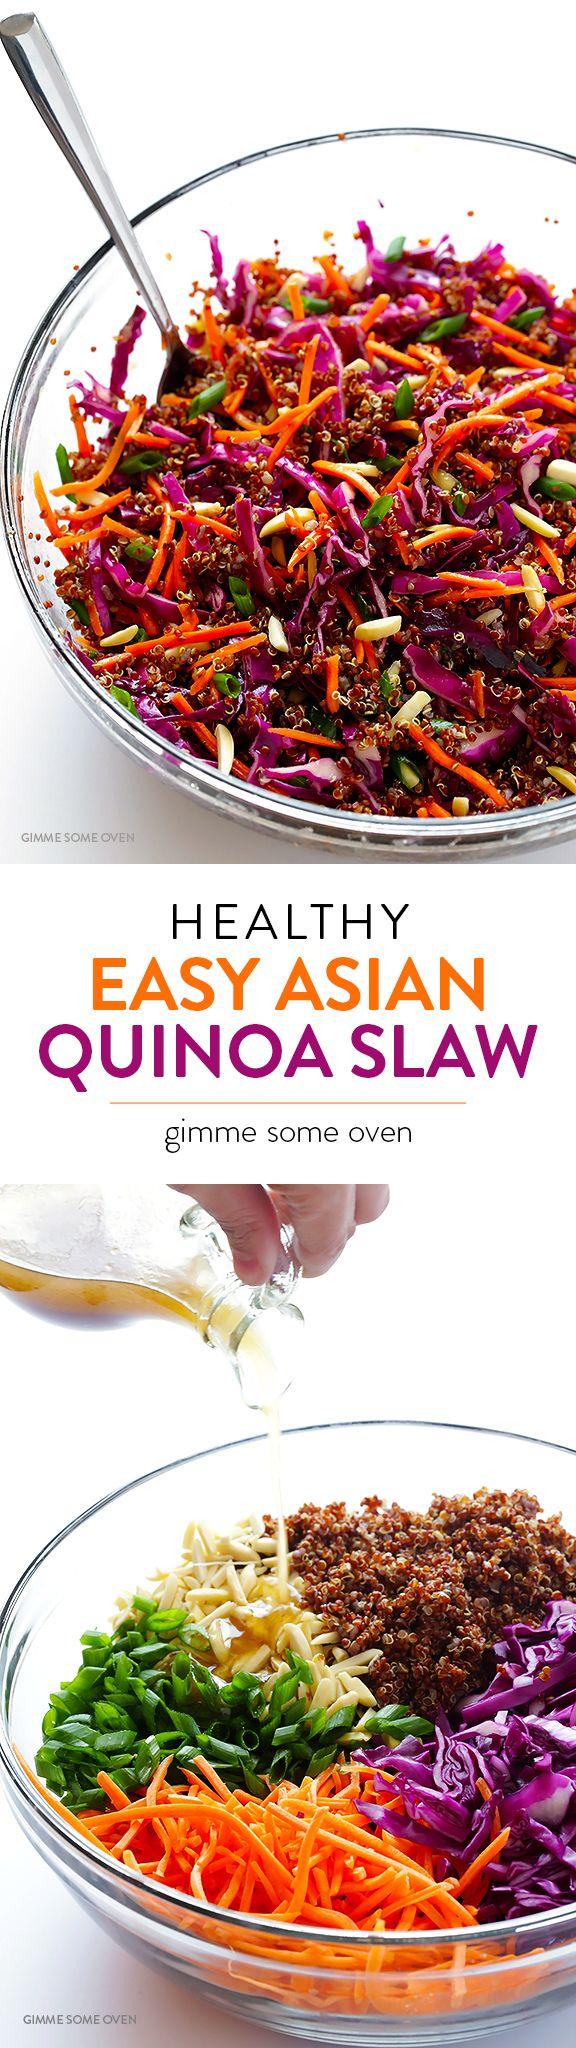 Easy Sesame Quinoa Slaw Gimme Some Oven Recipe Healthy Whole Food Recipes Asian Quinoa Salad